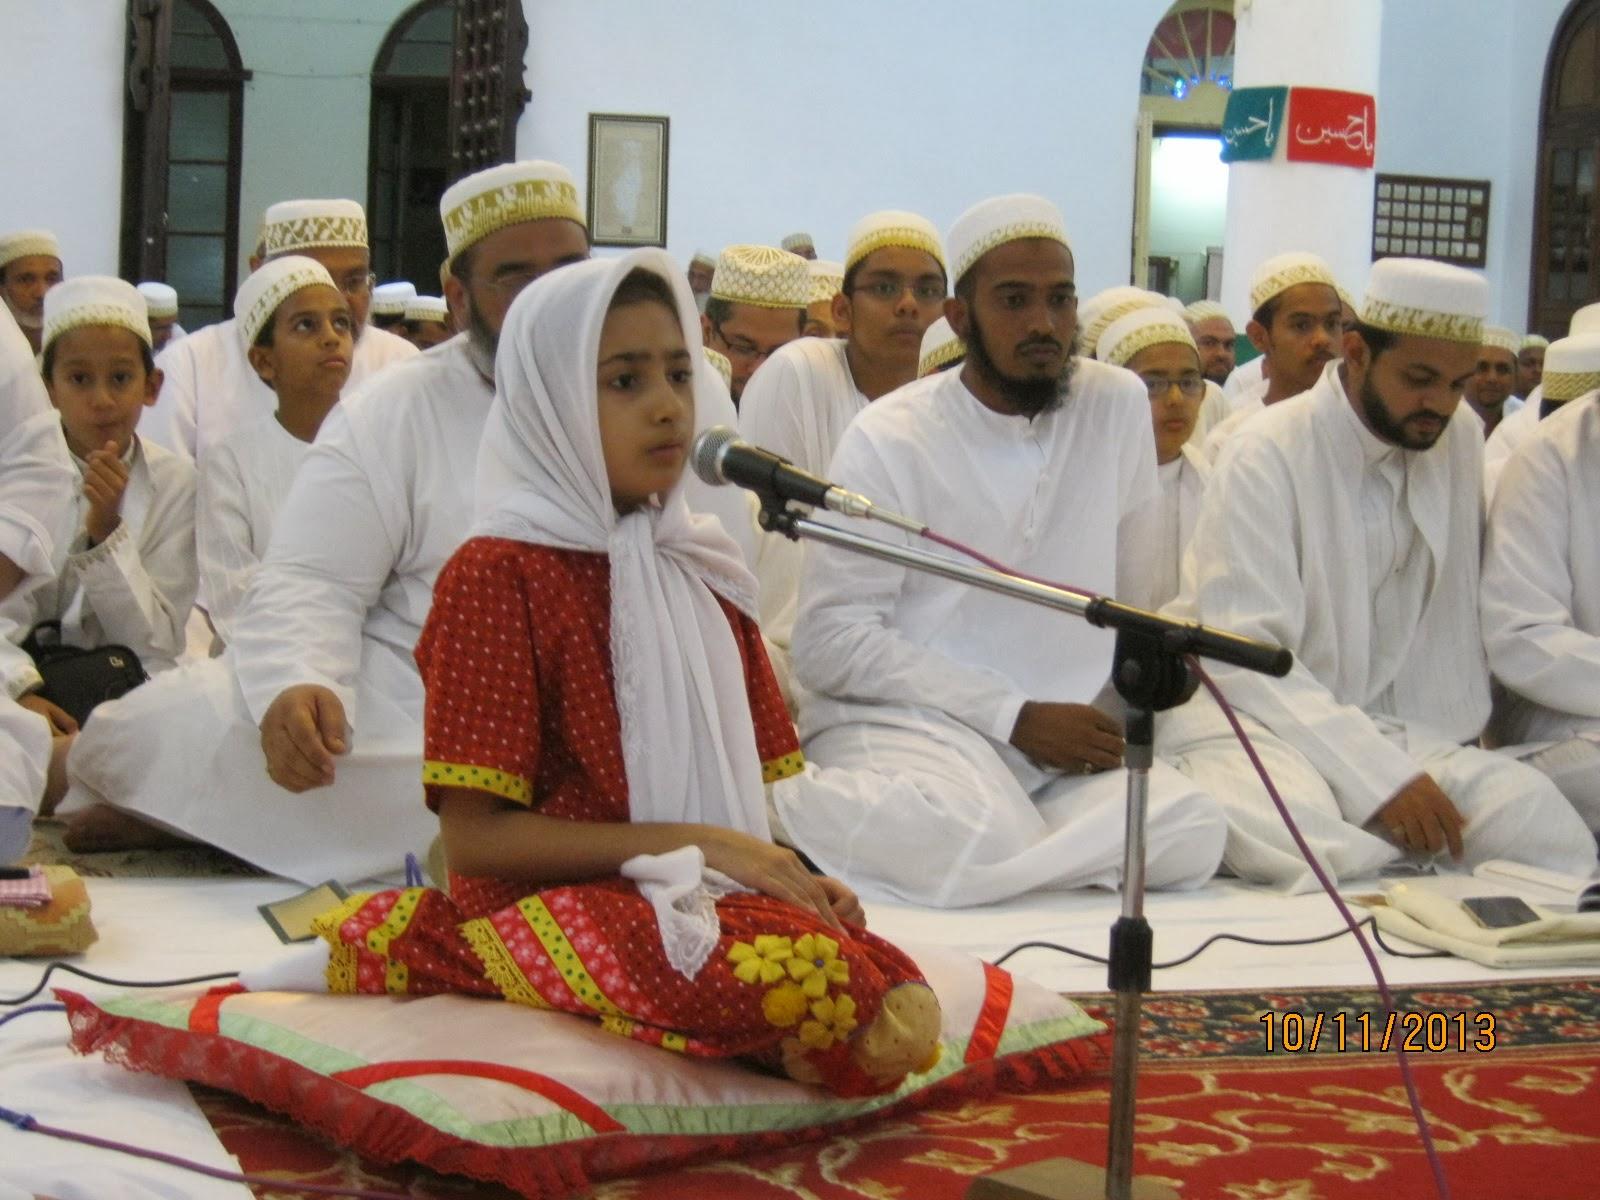 Dawoodi Bohra Jamaat Events of Majunga, Madagascar (Anjumane